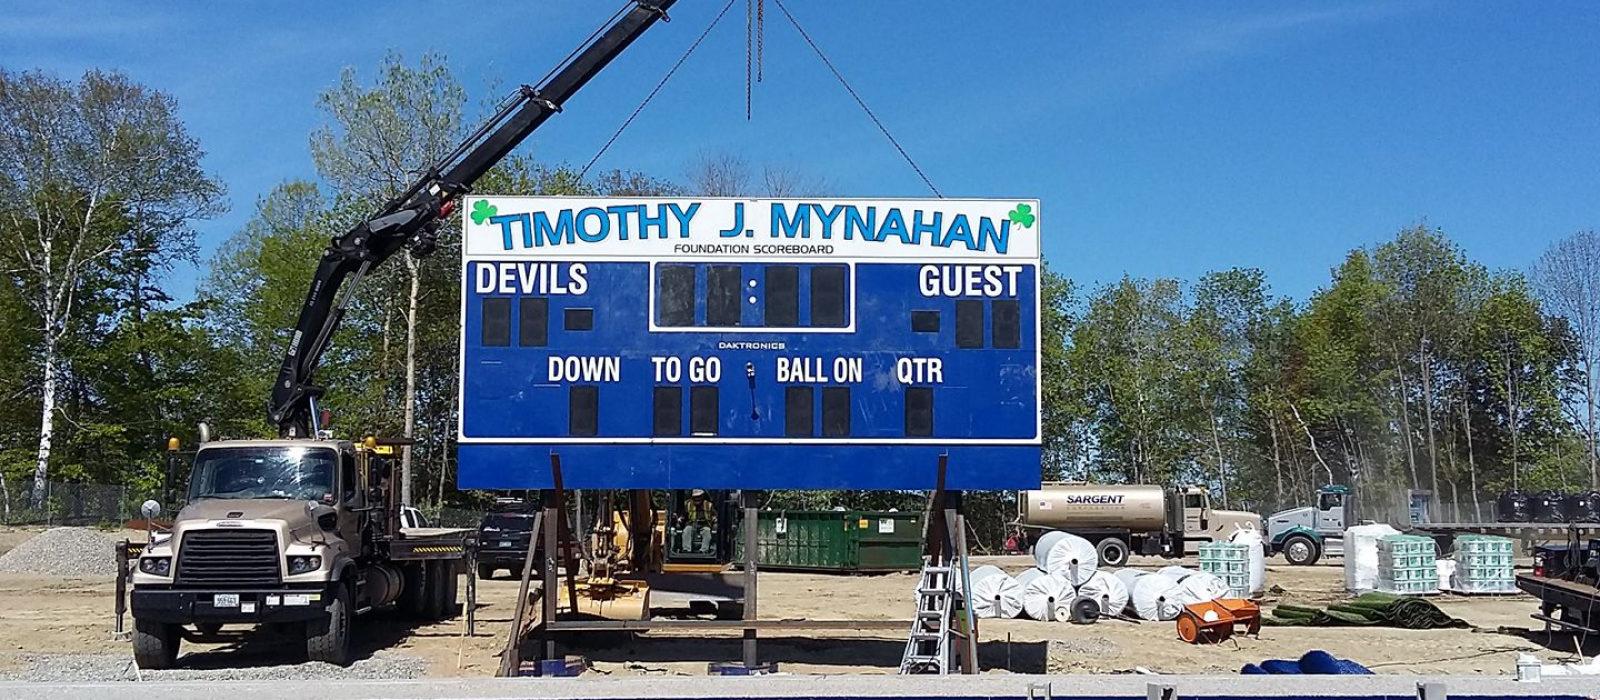 Timothy J. Mynahan Foundation Scoreboard